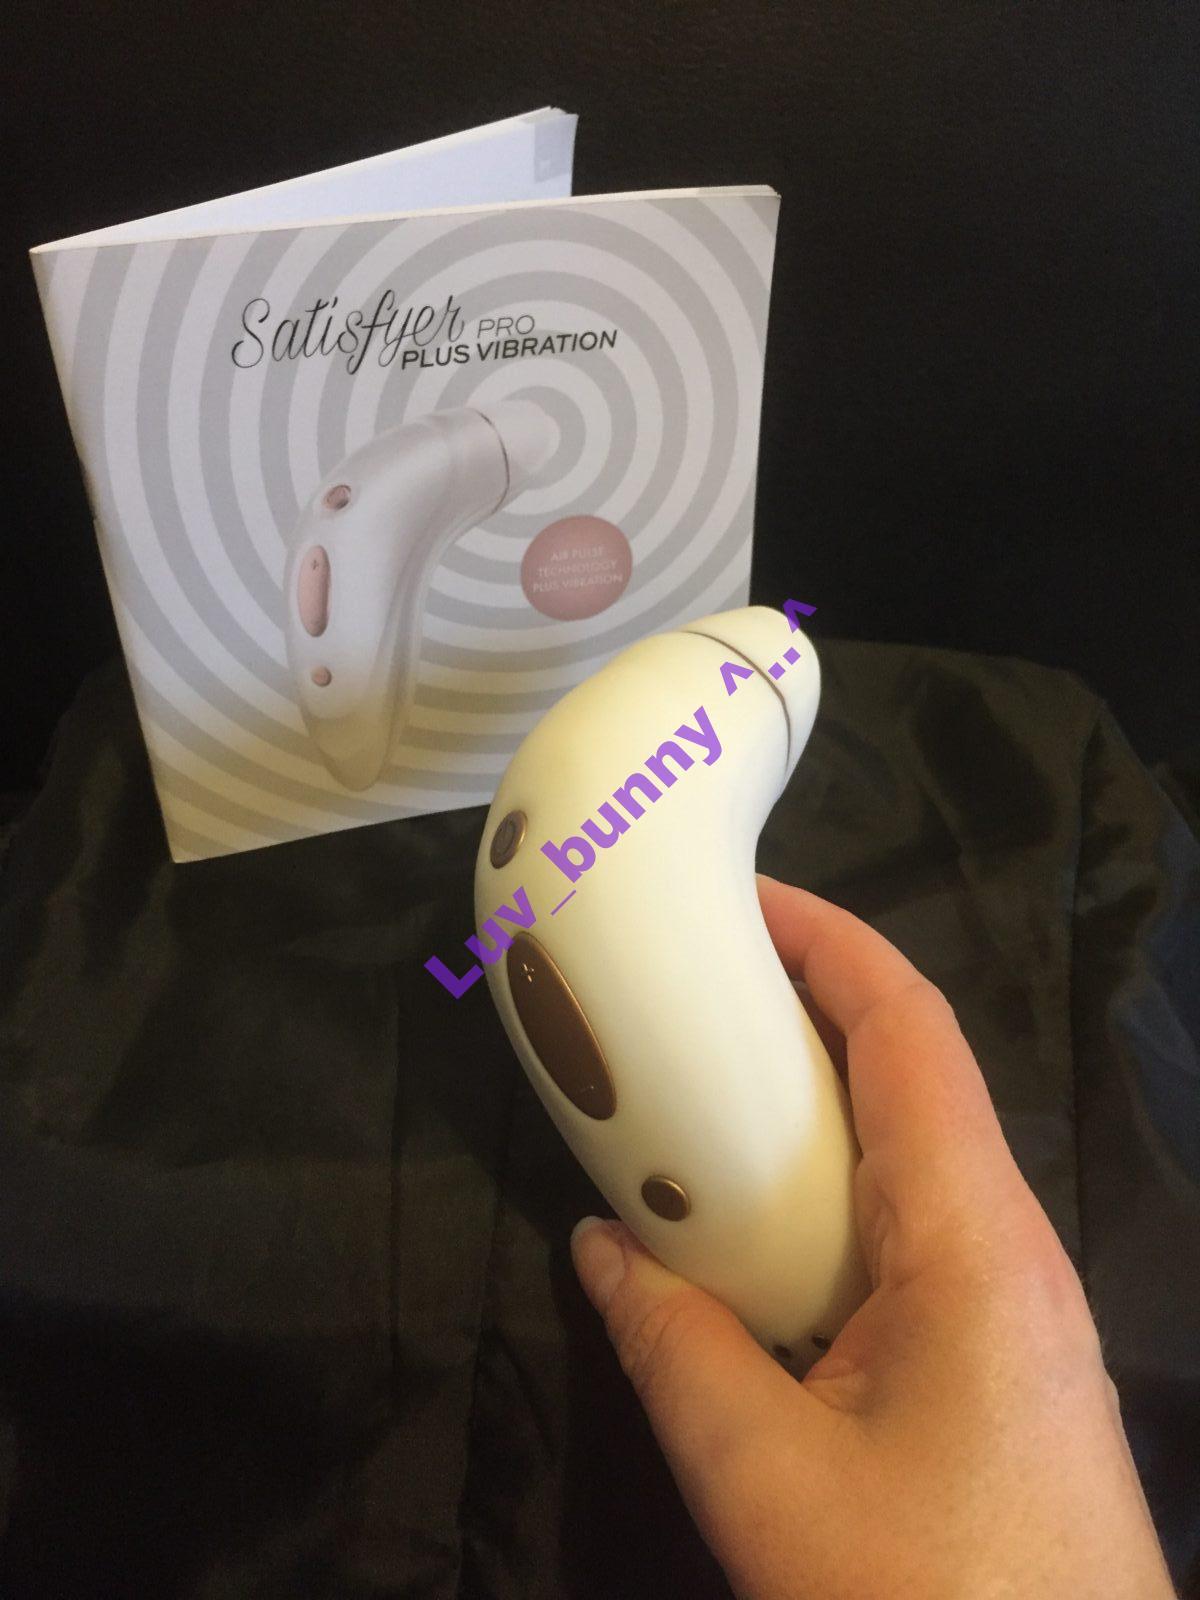 Satisfyer's Succubuzz; the Satisfyer Pro Plus Vibration